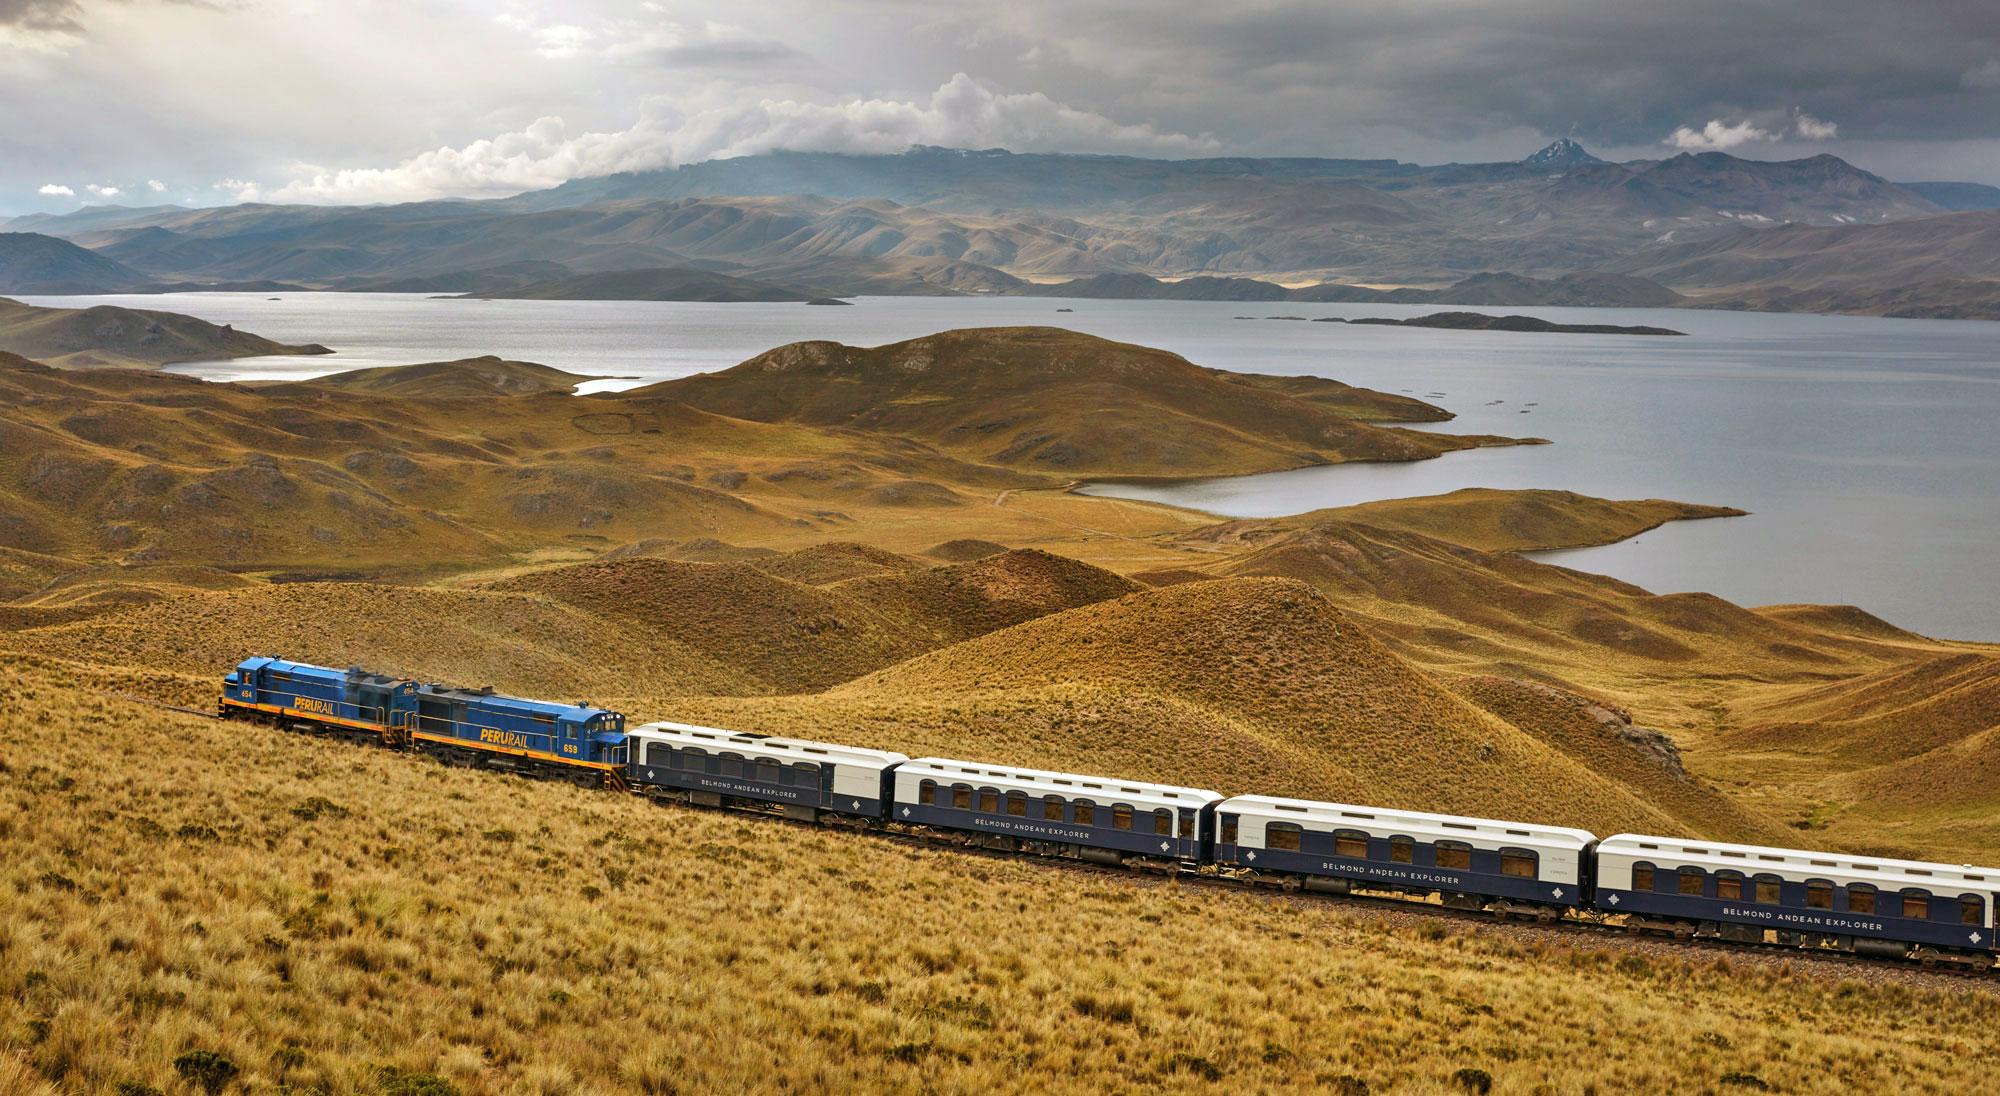 Andean Explorer Train between Arequipa and Juliaca